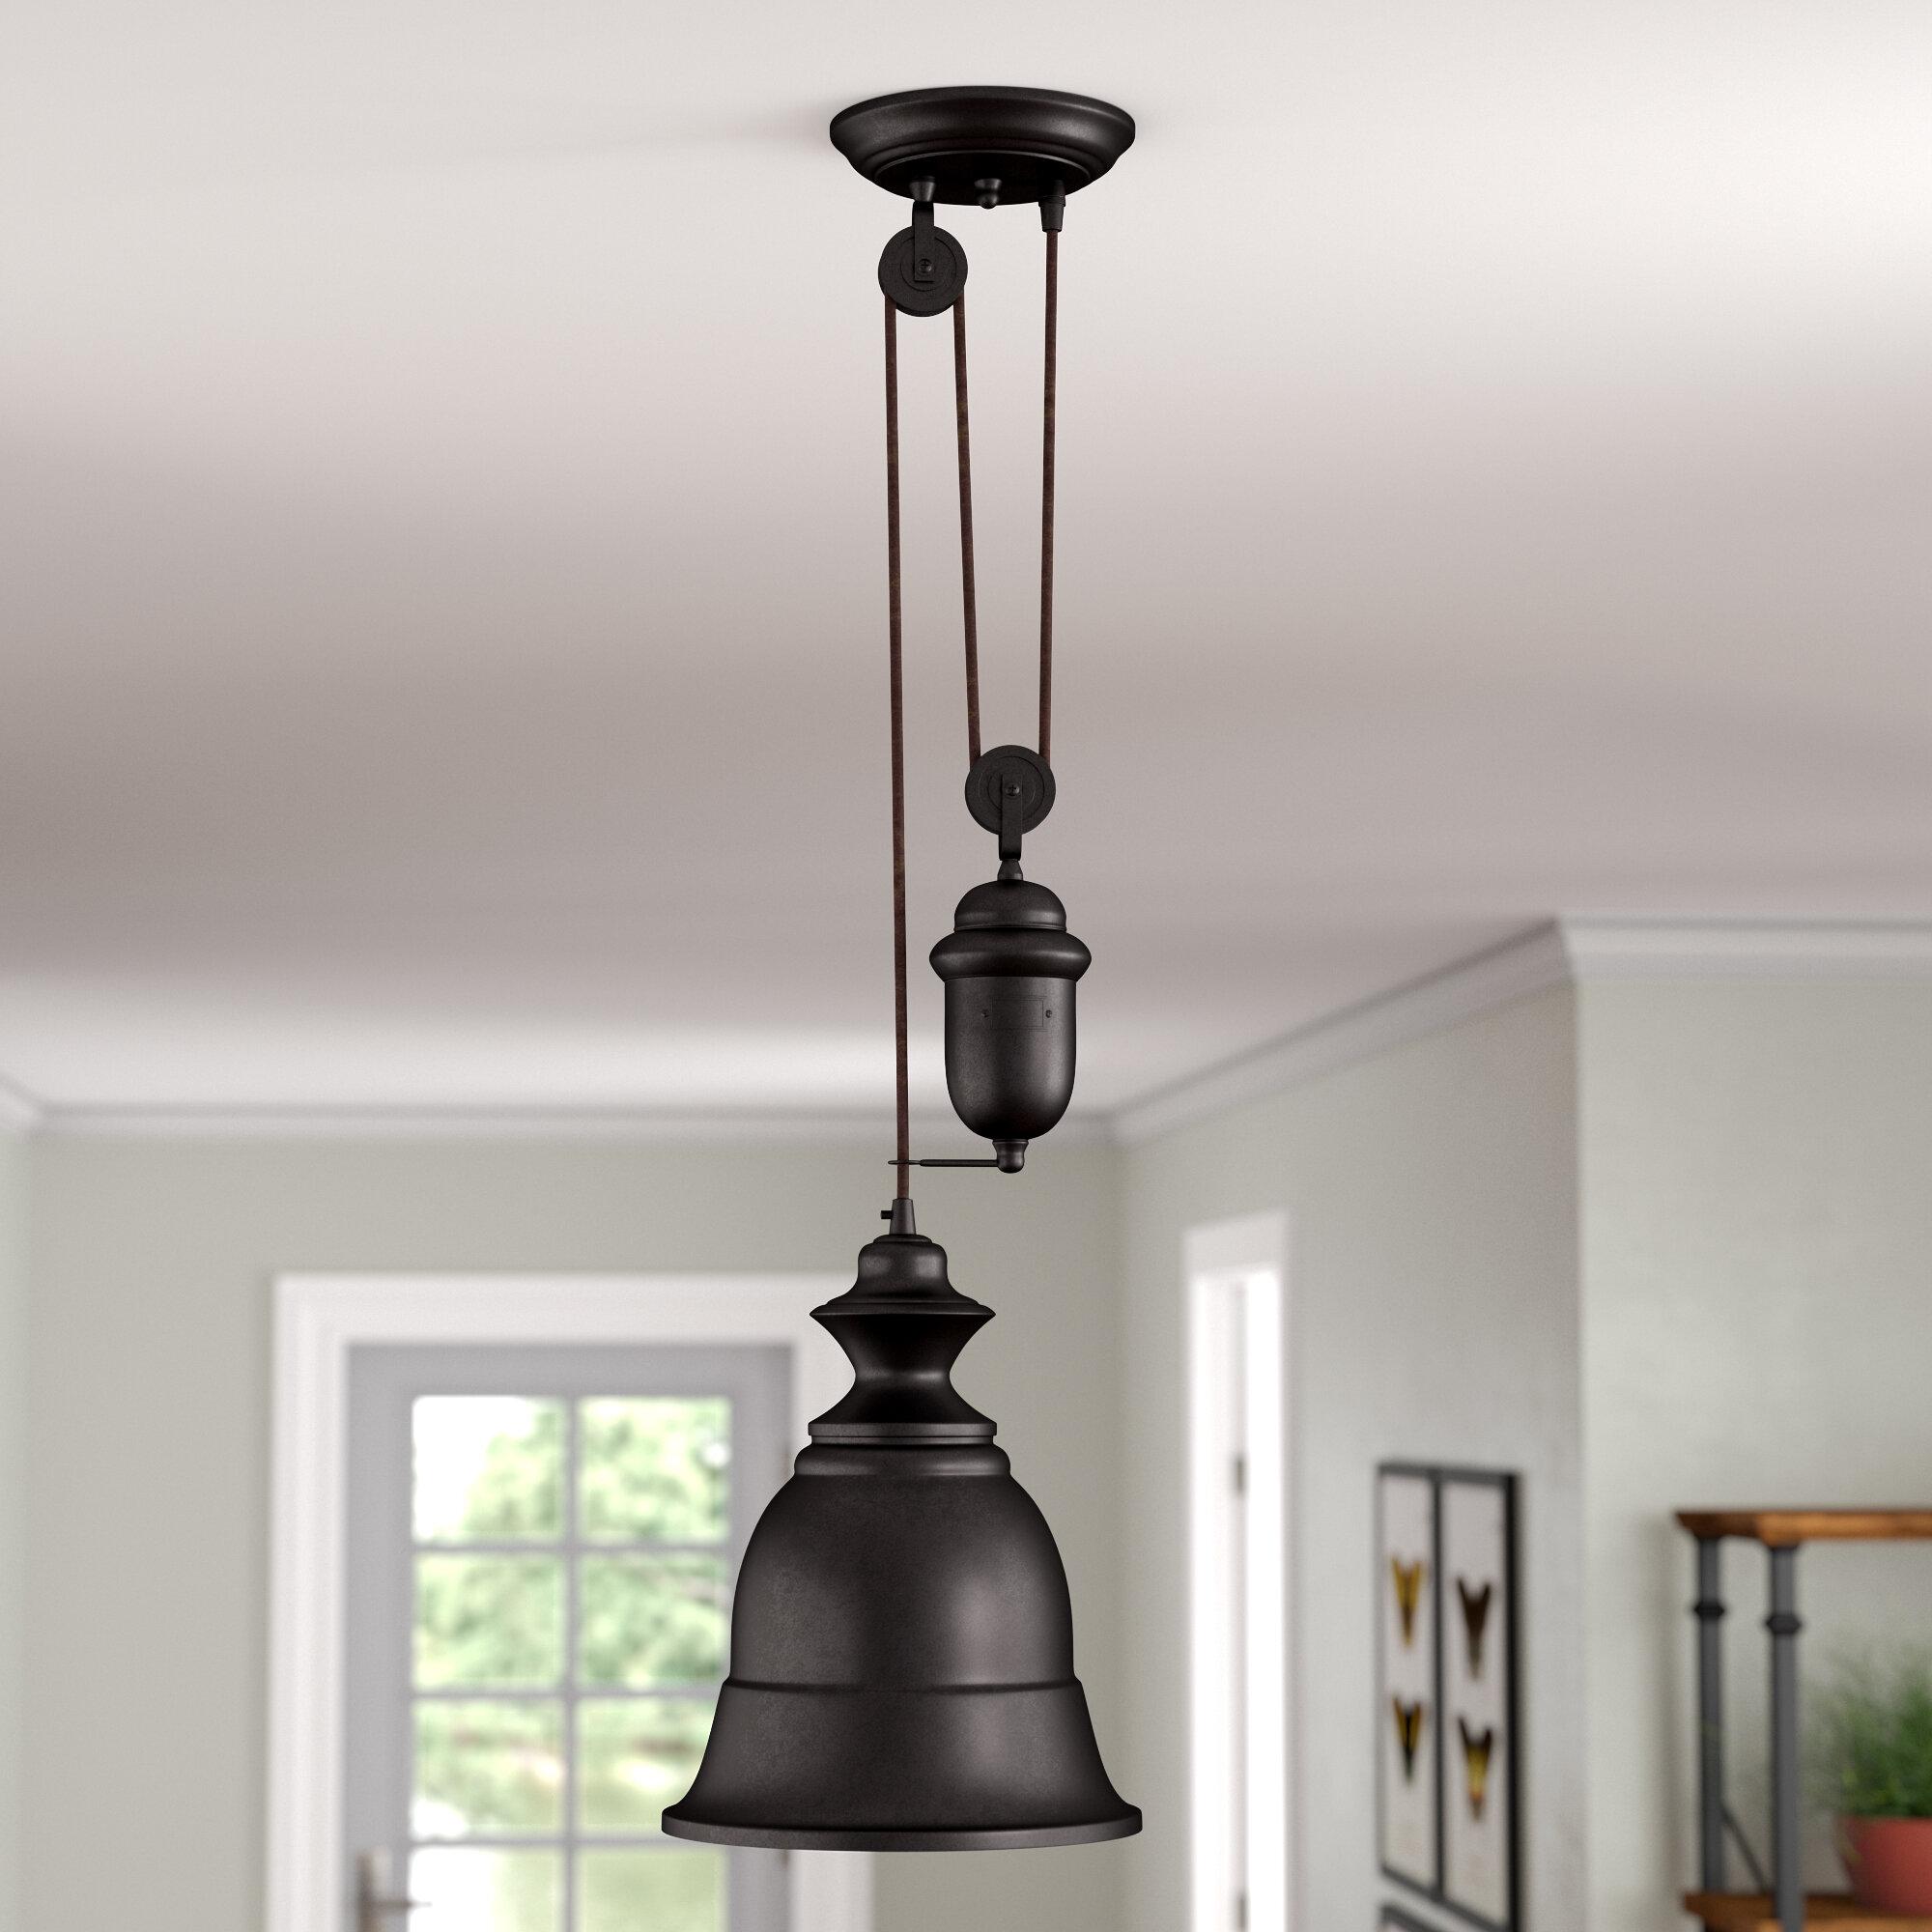 August Grove Elsenborn 1-Light Bell Pendant & Reviews | Wayfair